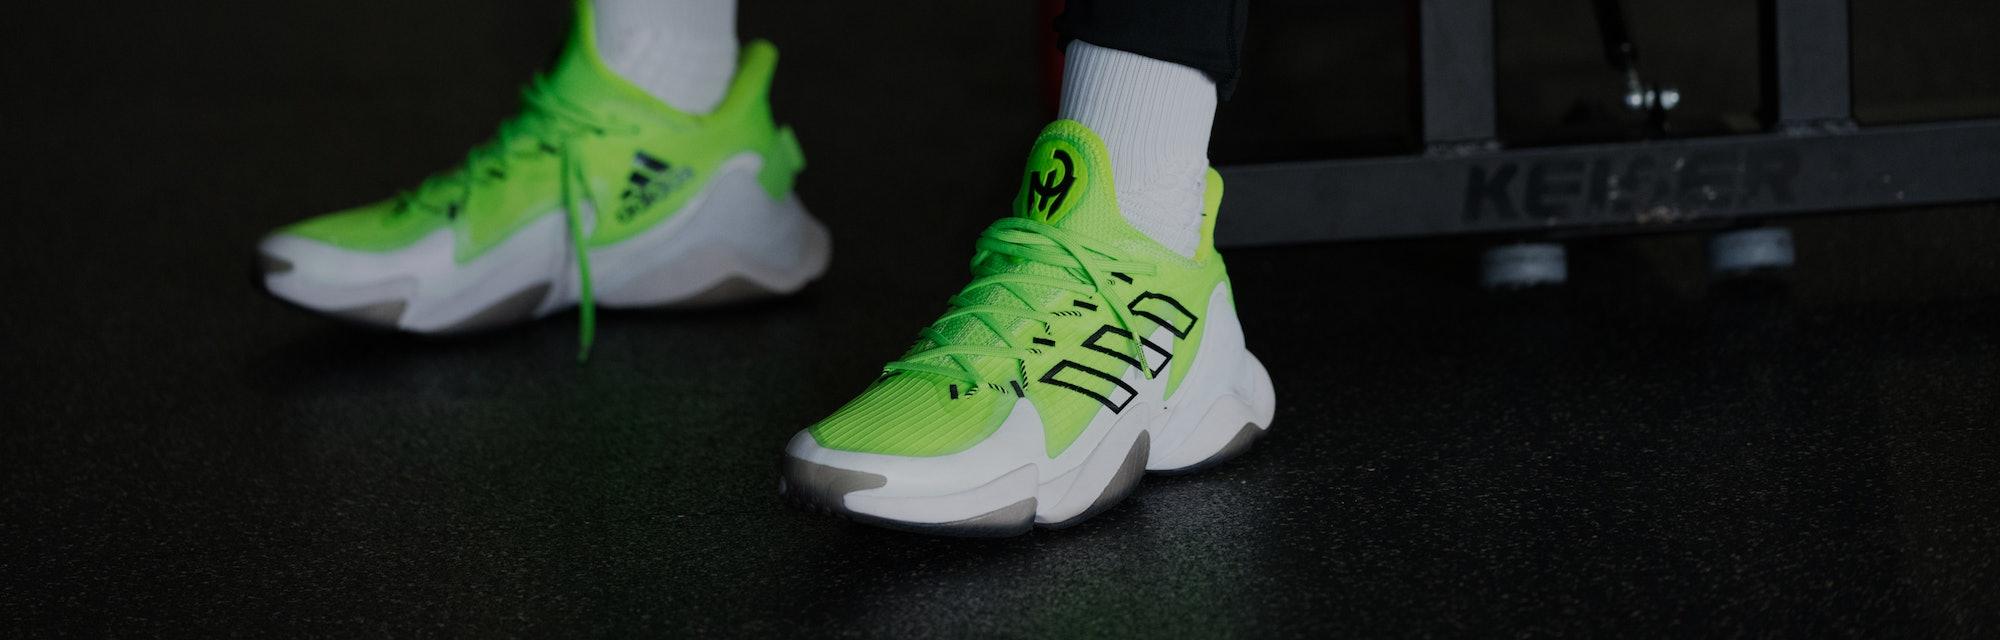 Adidas Patrick Mahomes 1.0 FLX